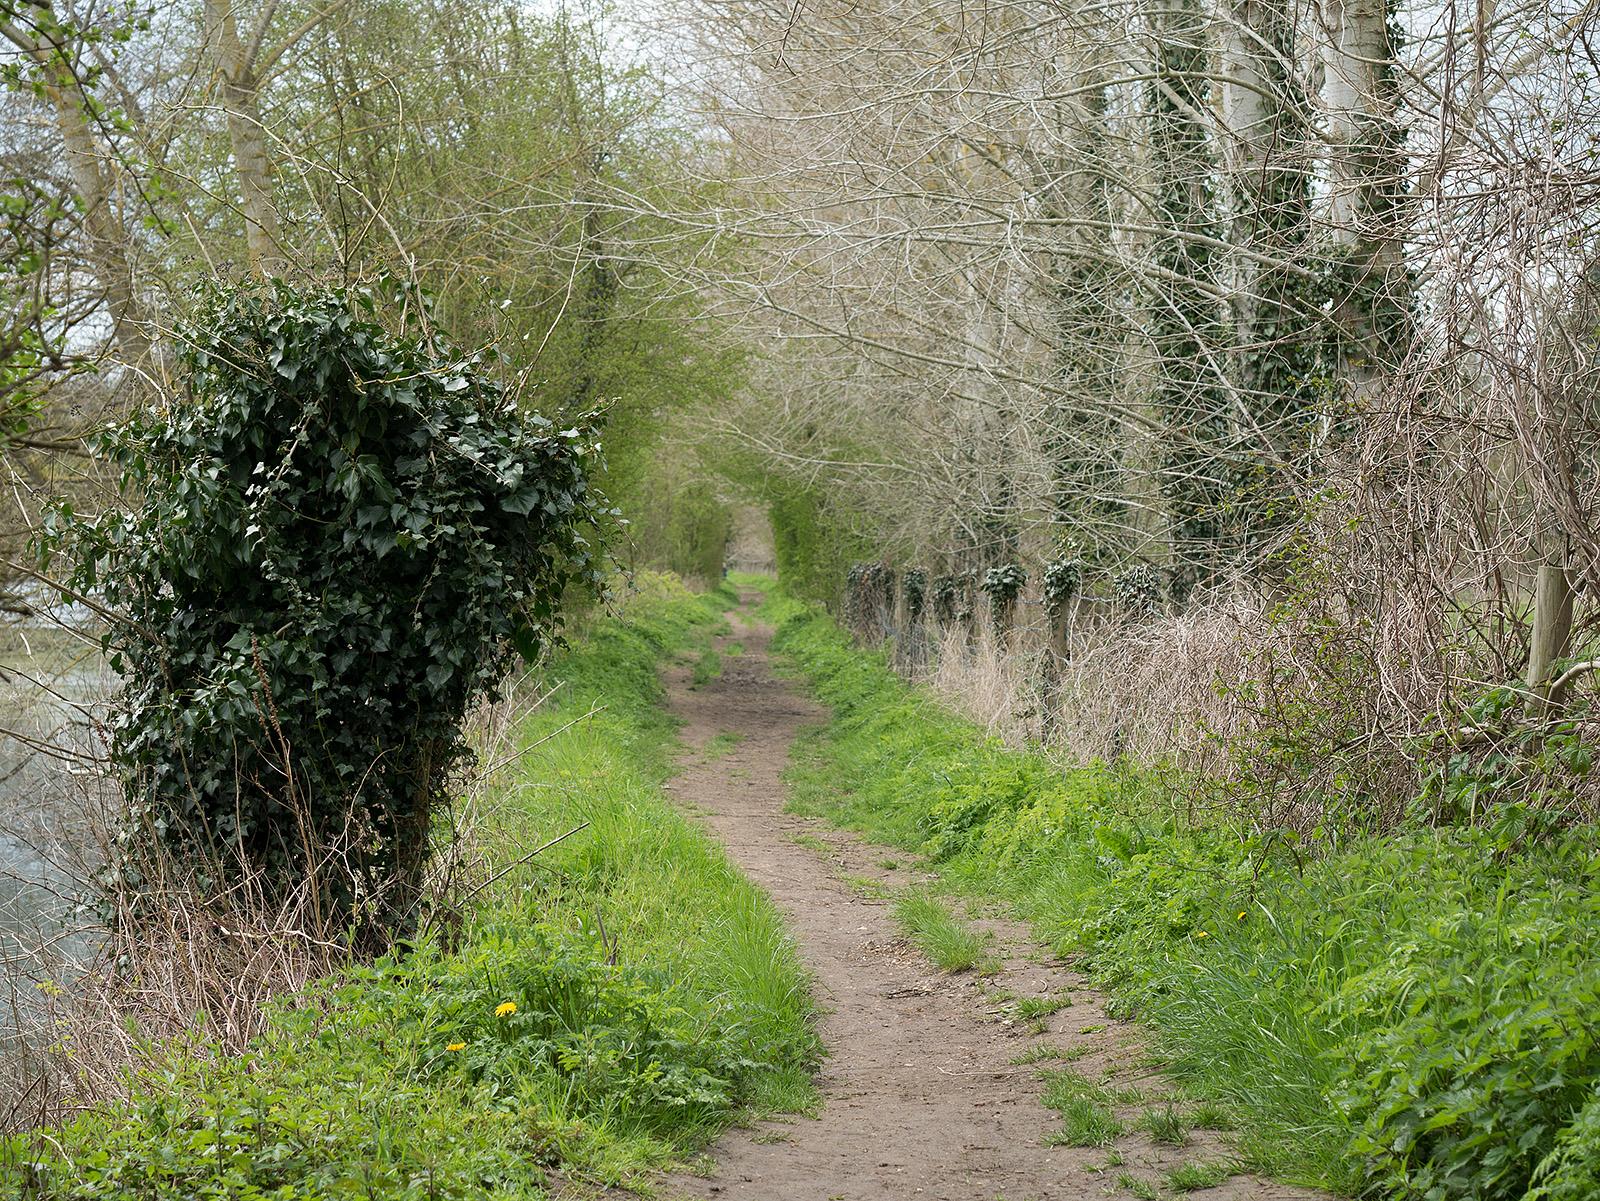 Heading towards Shillingford bridge - enclosed pathway.